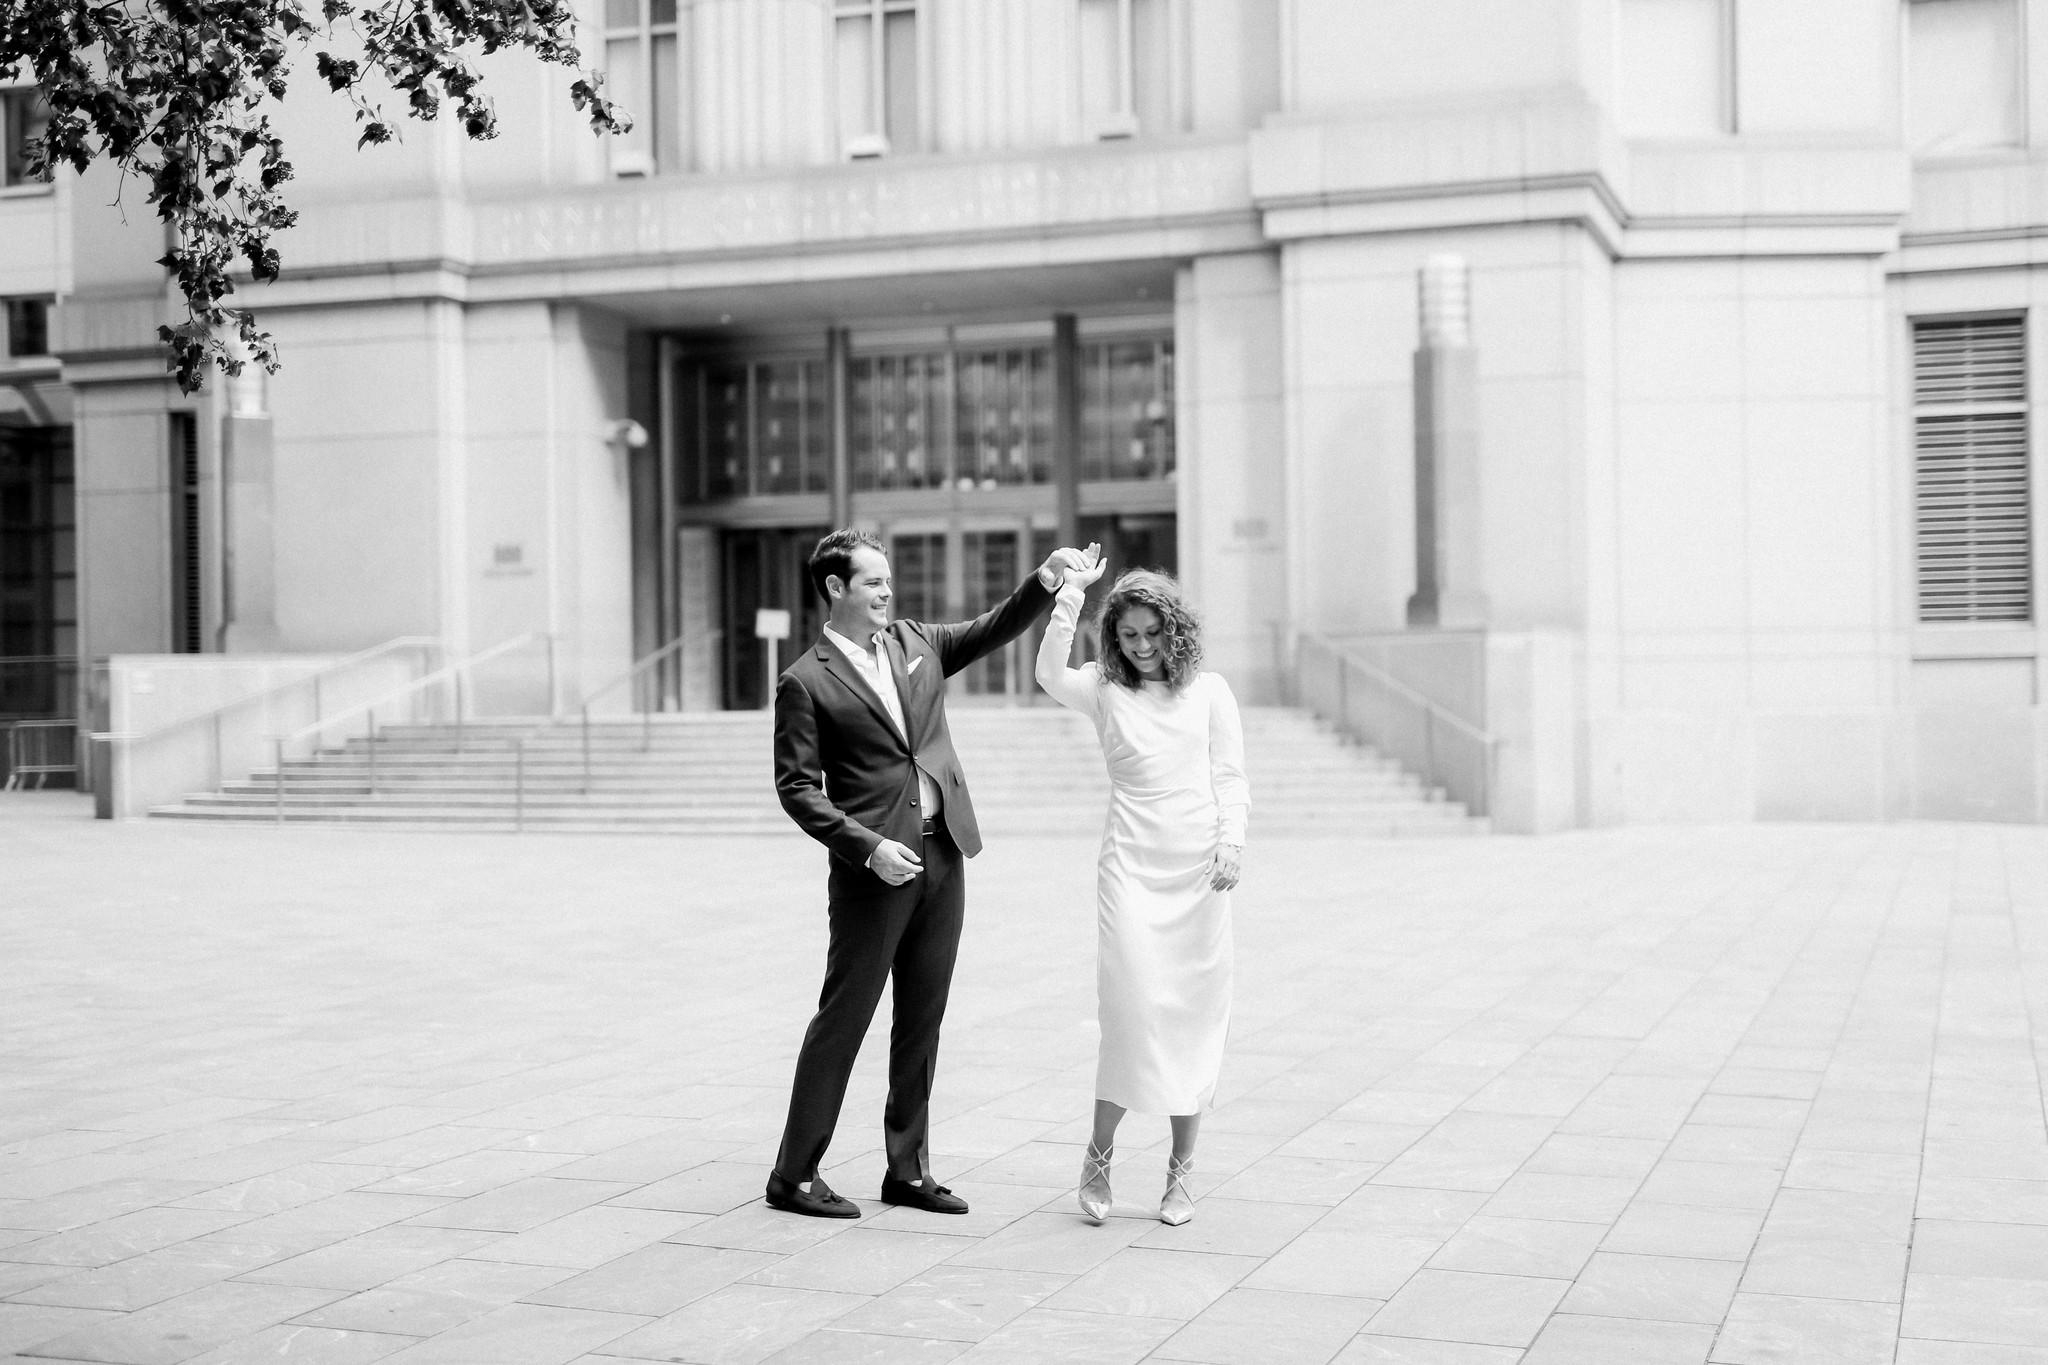 NY city hall wedding__ct wedding_ct wedding photographer-5.jpg